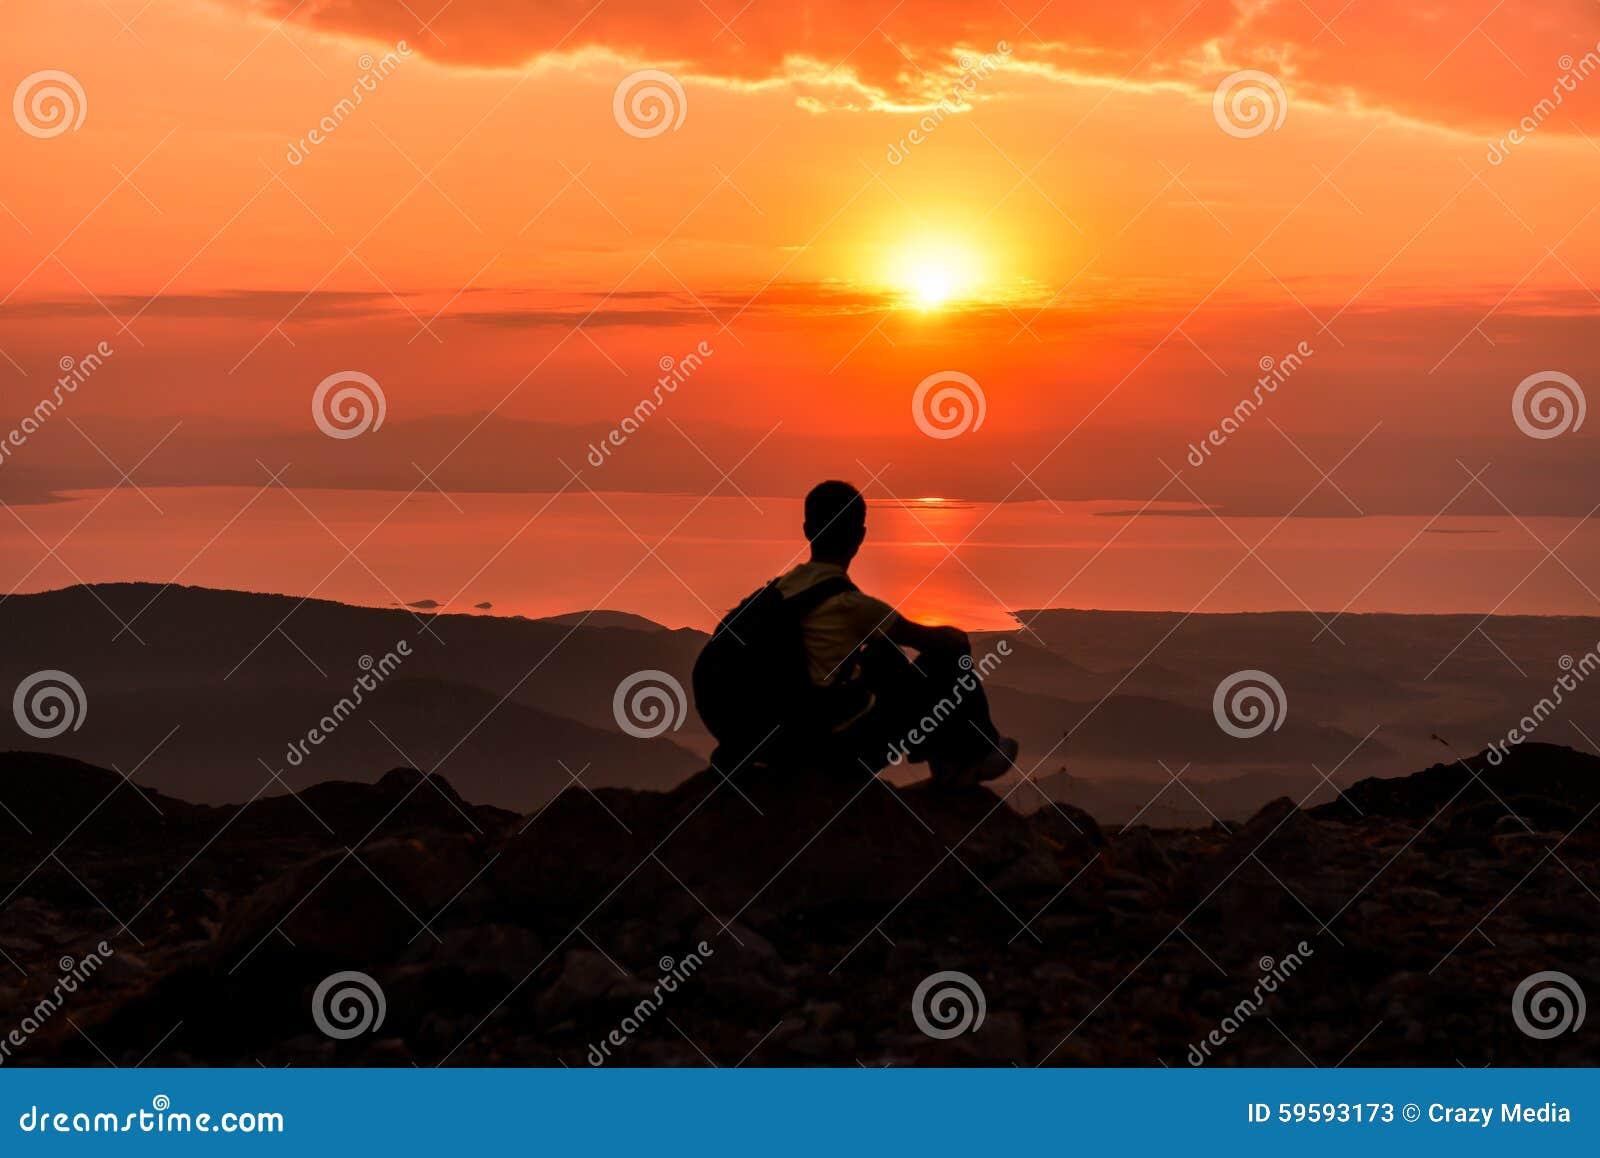 Sunrise At The Summit Of The Mountain Stock Image Image Of World